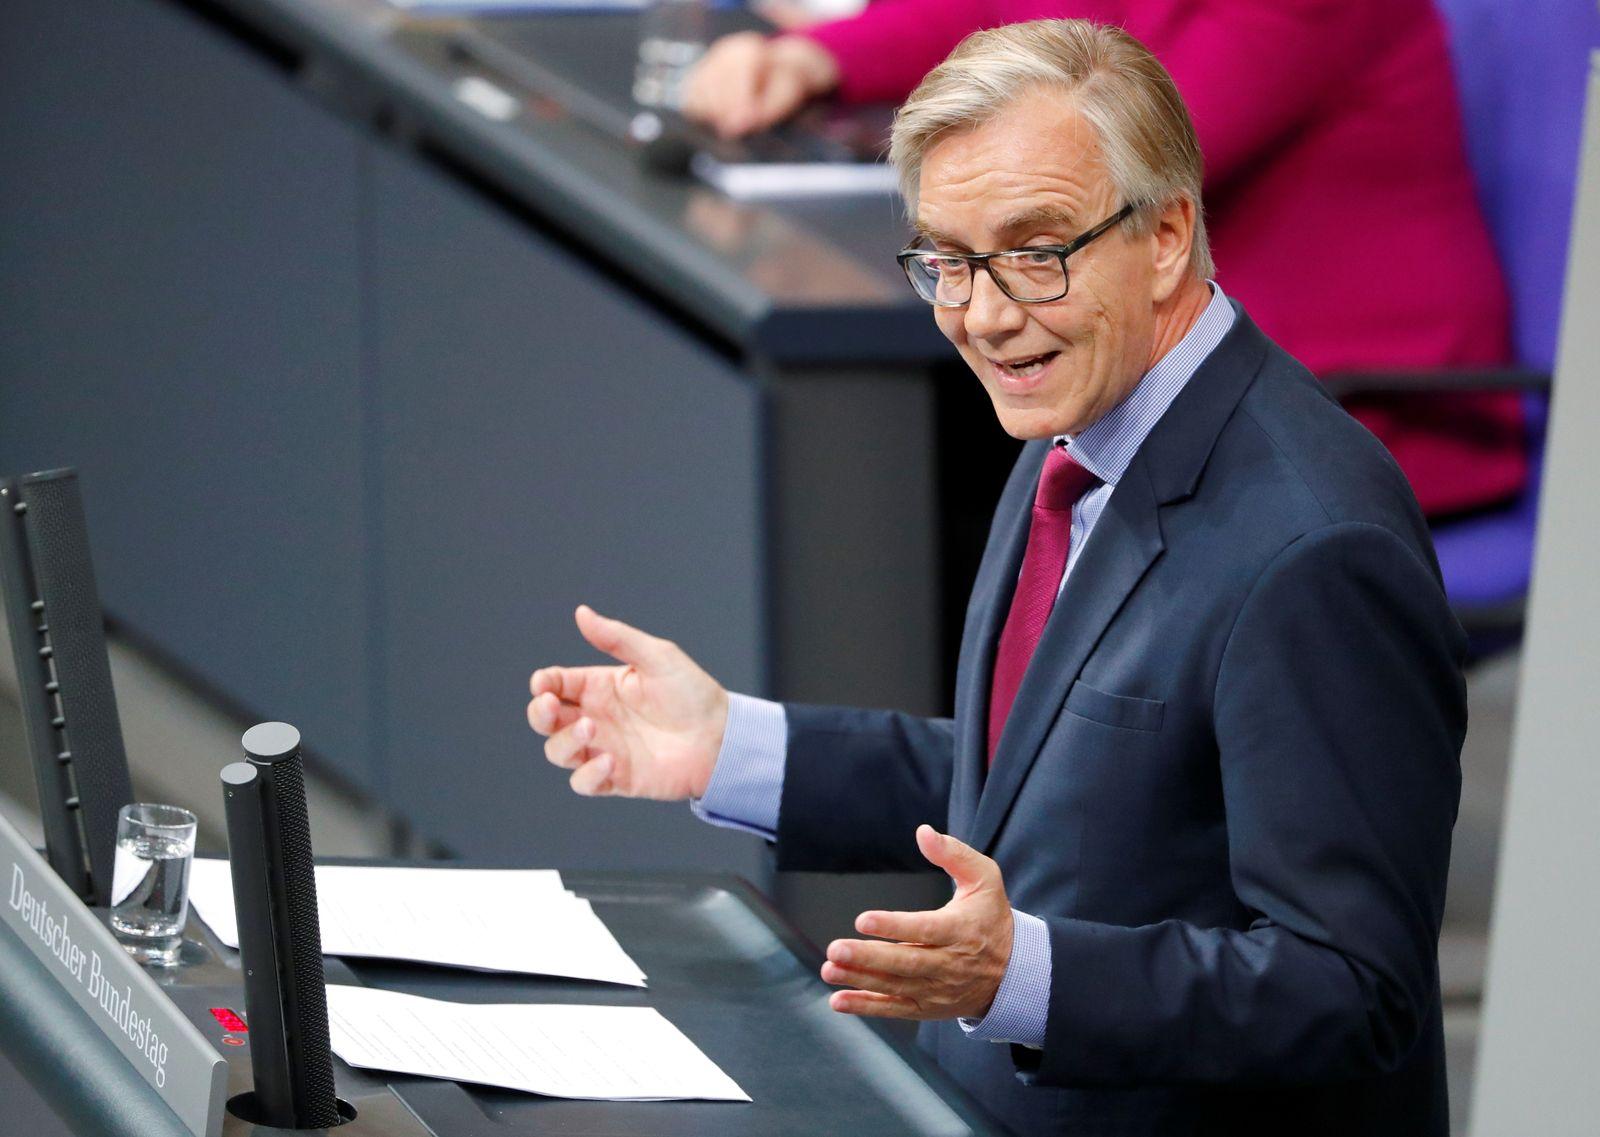 GERMANY-POLITICS/STEINMEIER